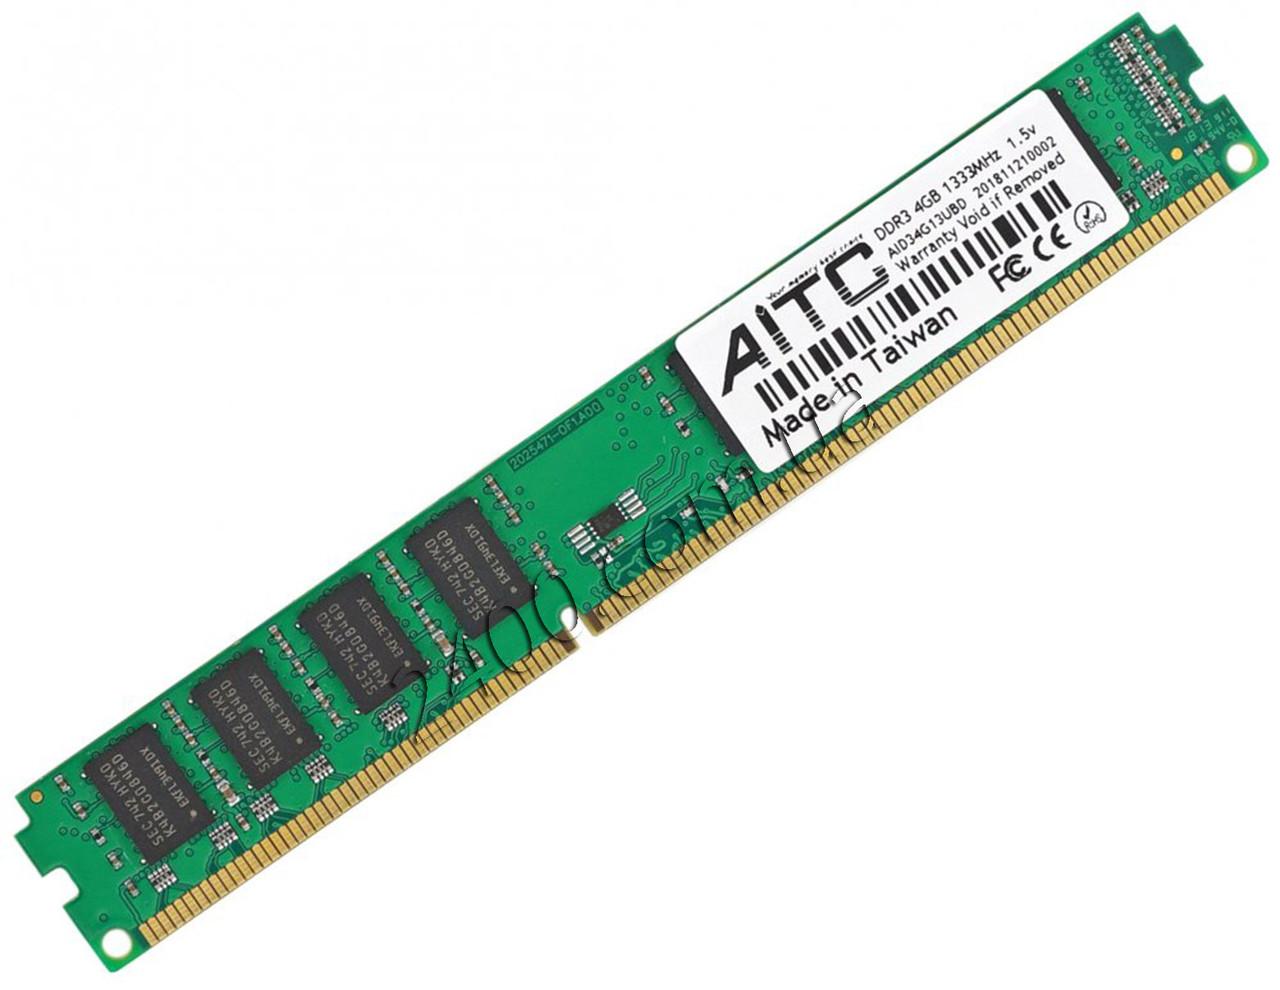 DDR3 4Gb 1333Mhz оперативная память (INTEL и AMD) универсальная PC3-10600 AITC DDR3-1333 4096MB AID34G13UB